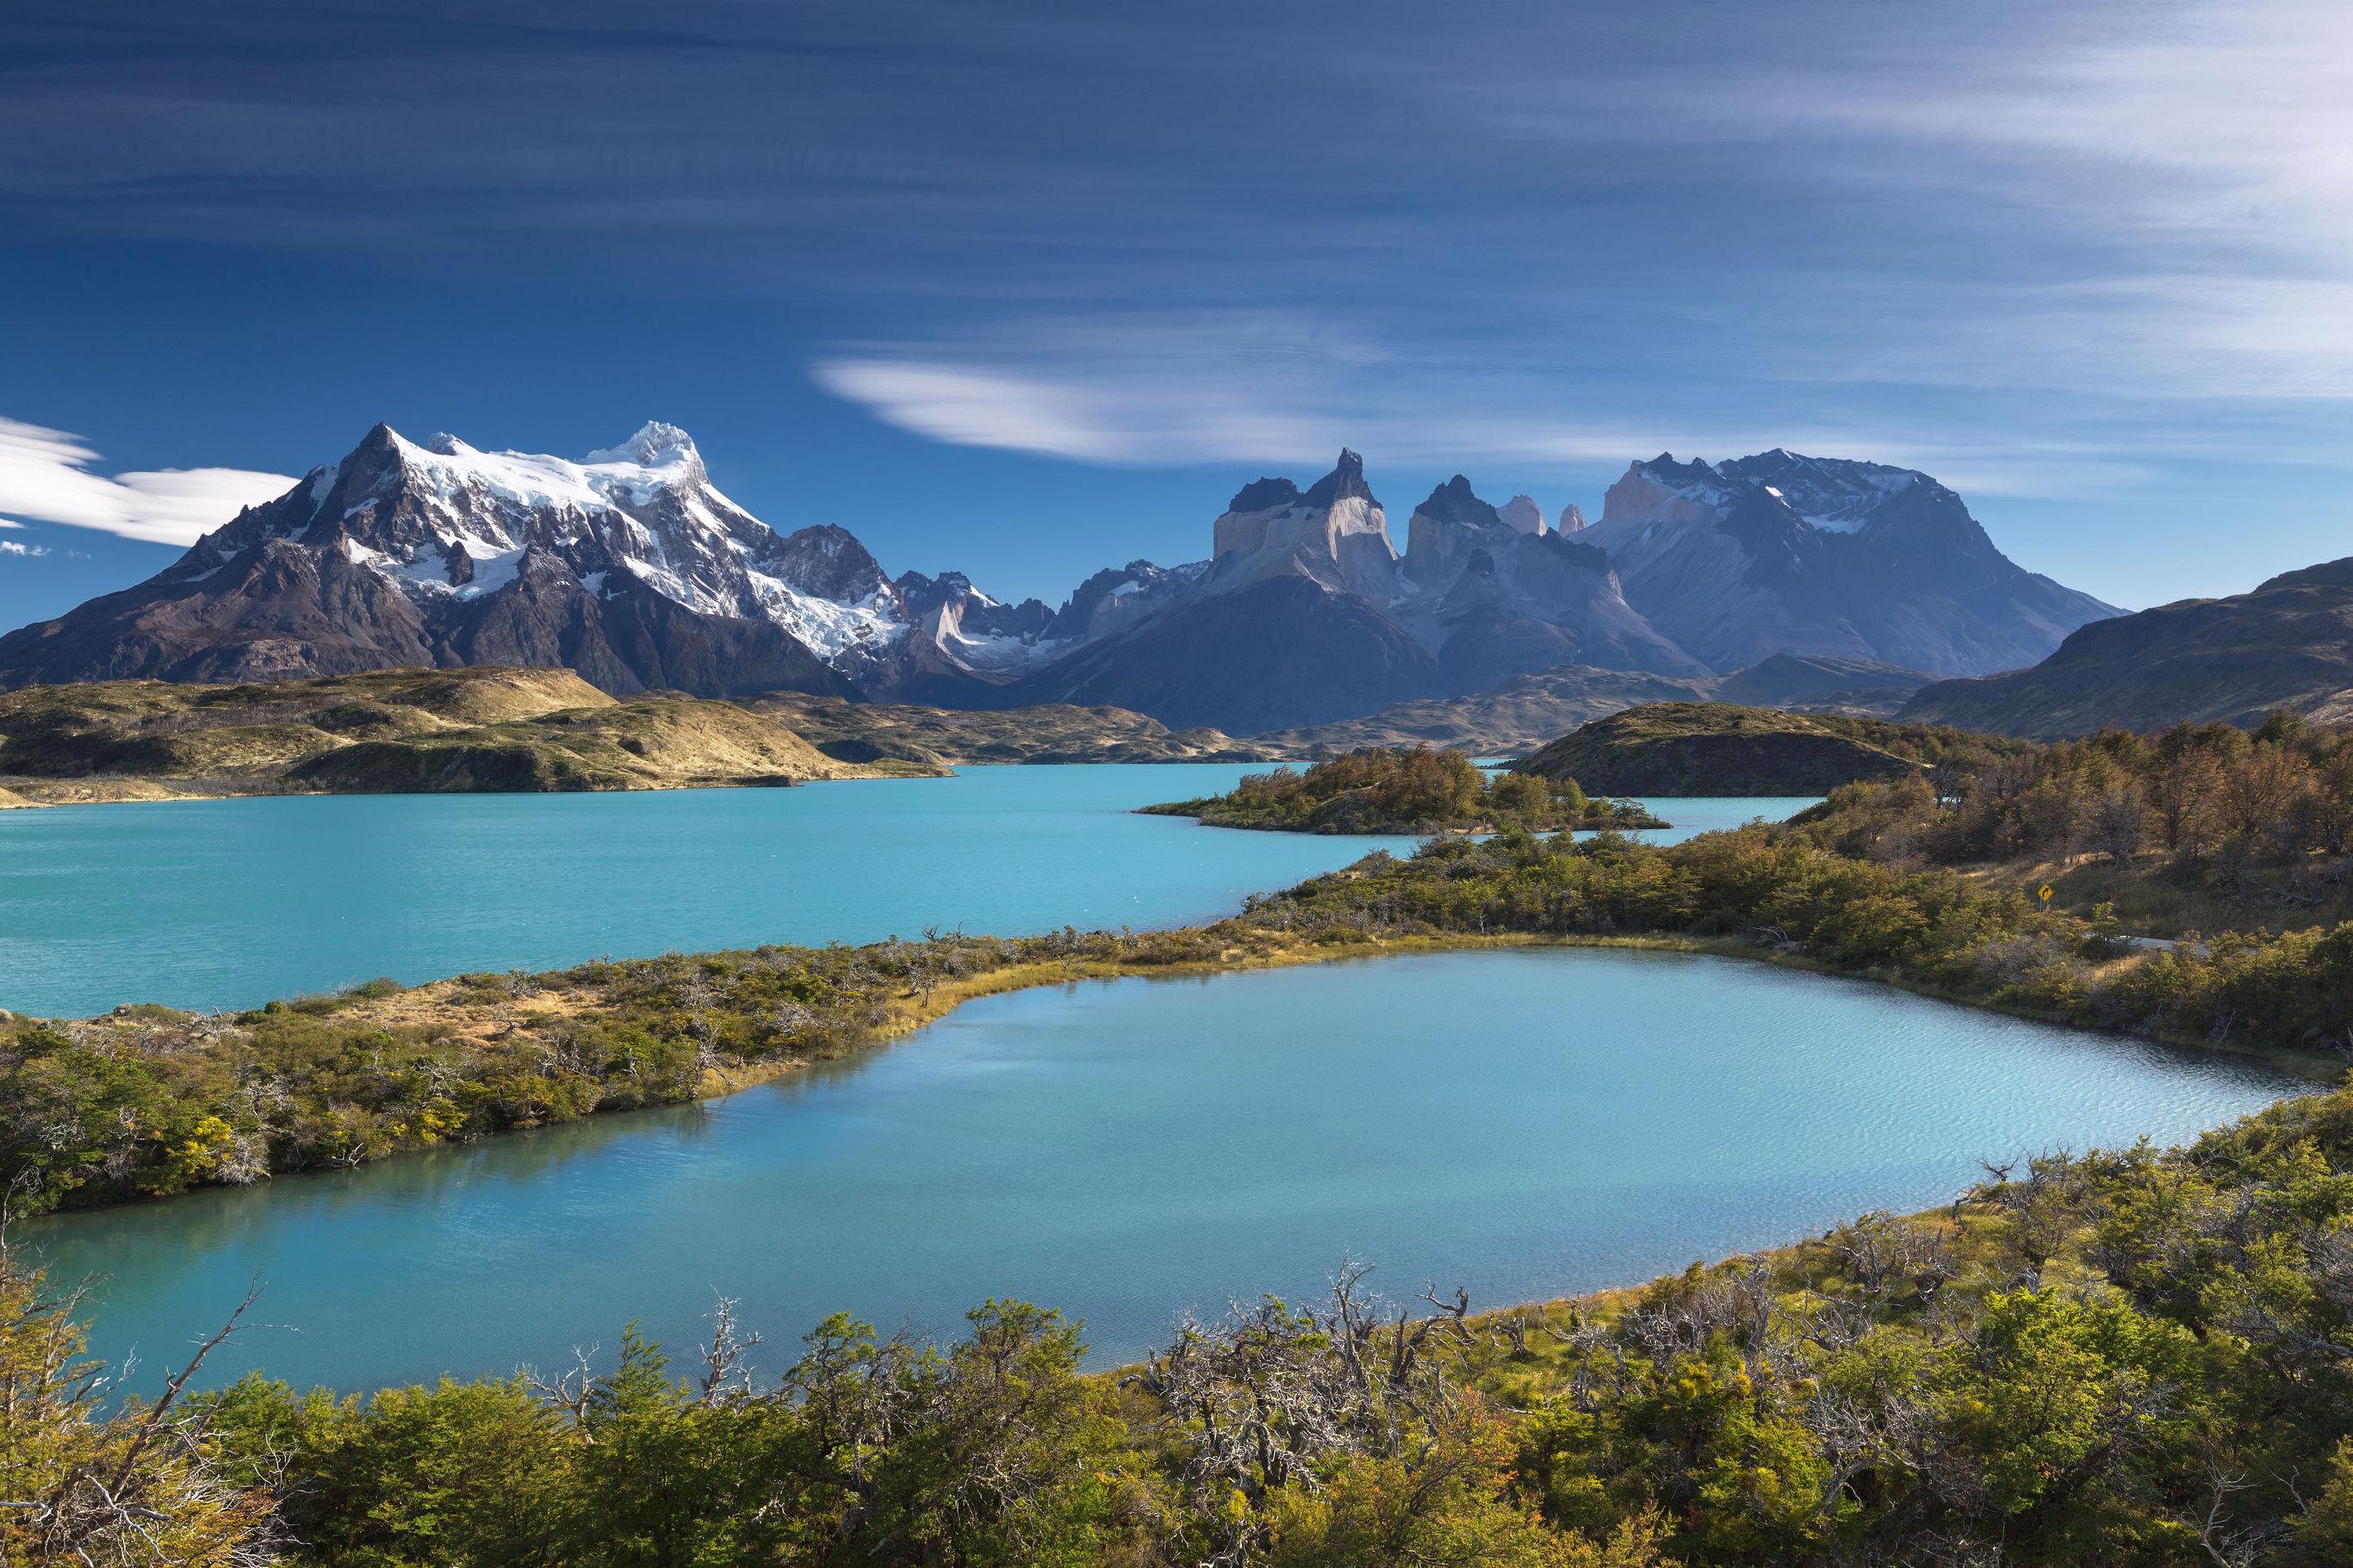 Sfeerimpressie Rondreis Chili: Hoogtepunten van Chili